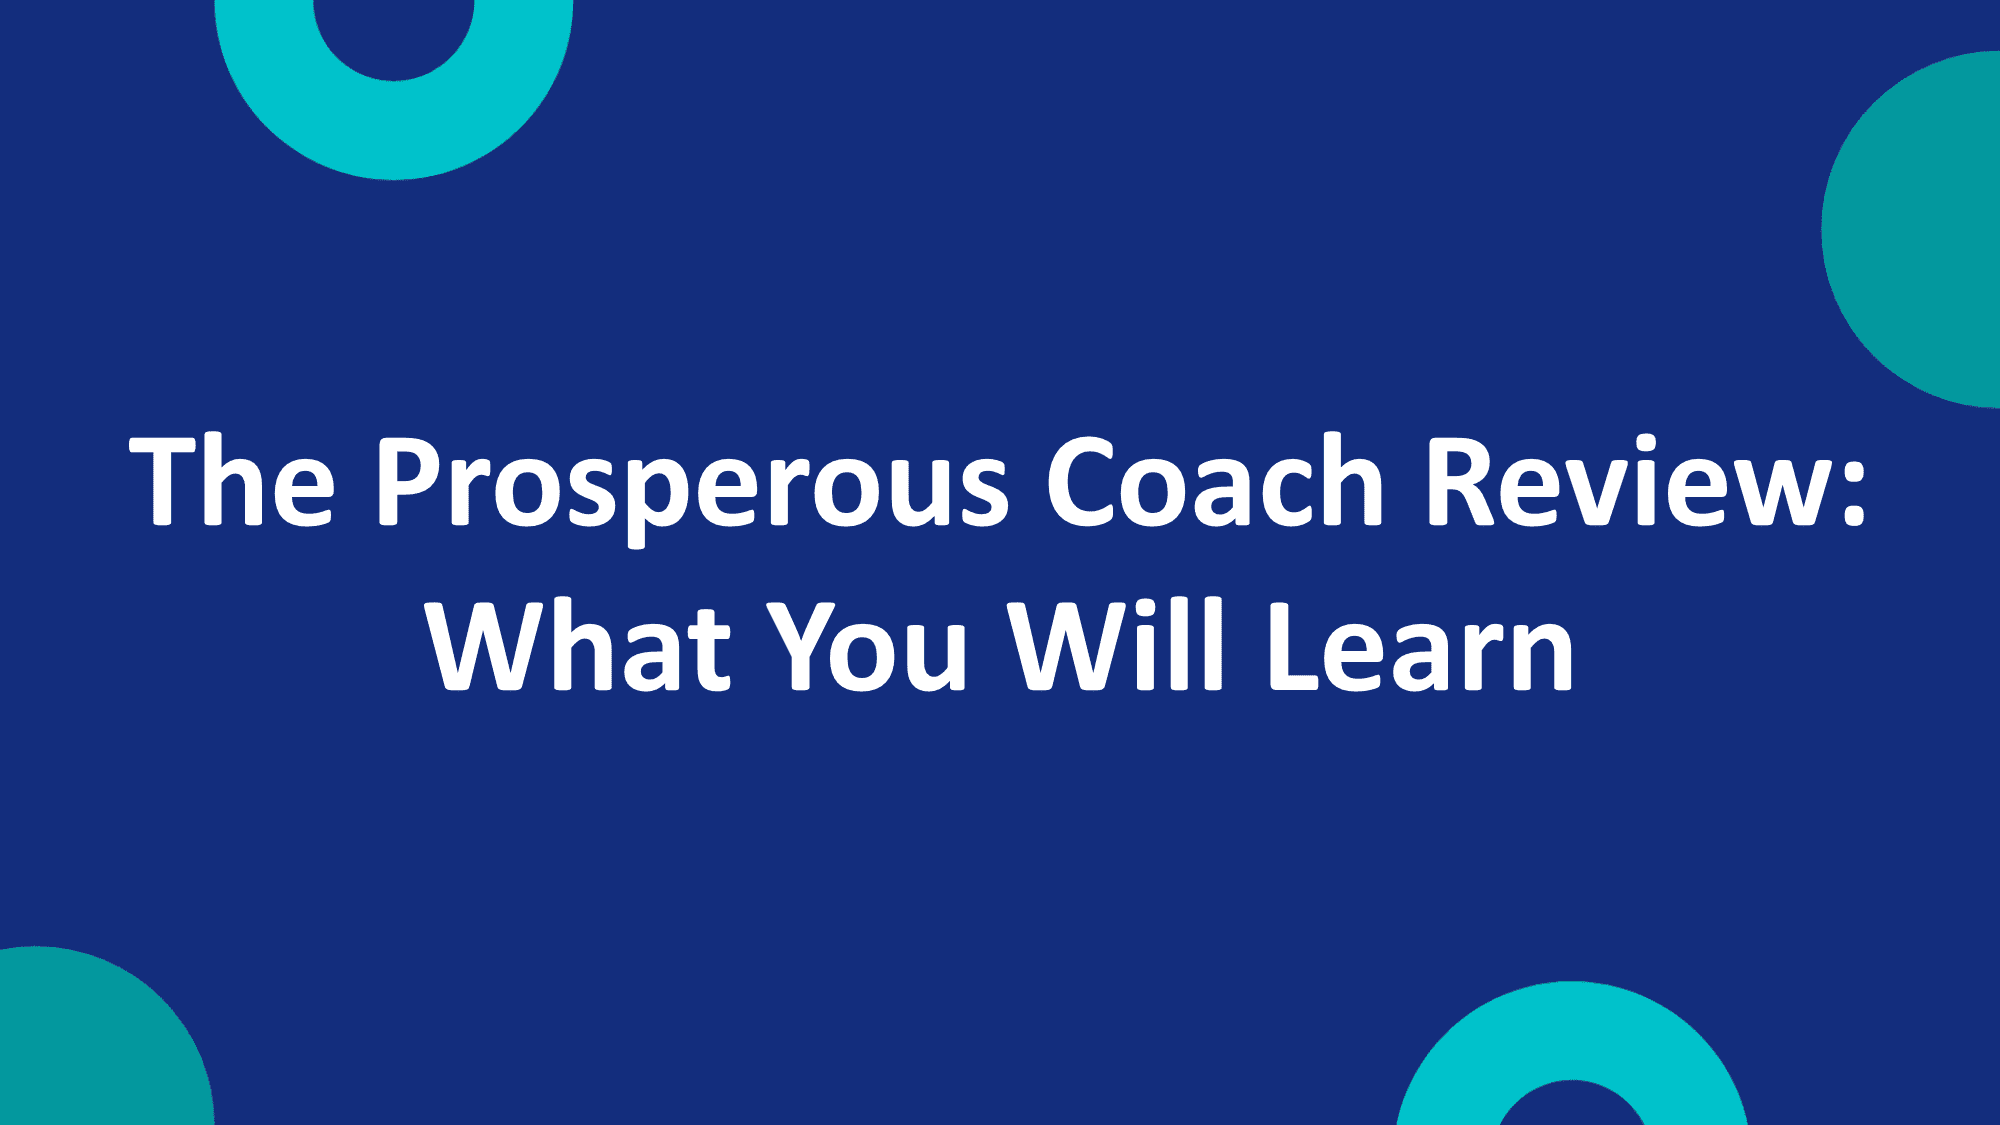 The Prosperous Coach Review